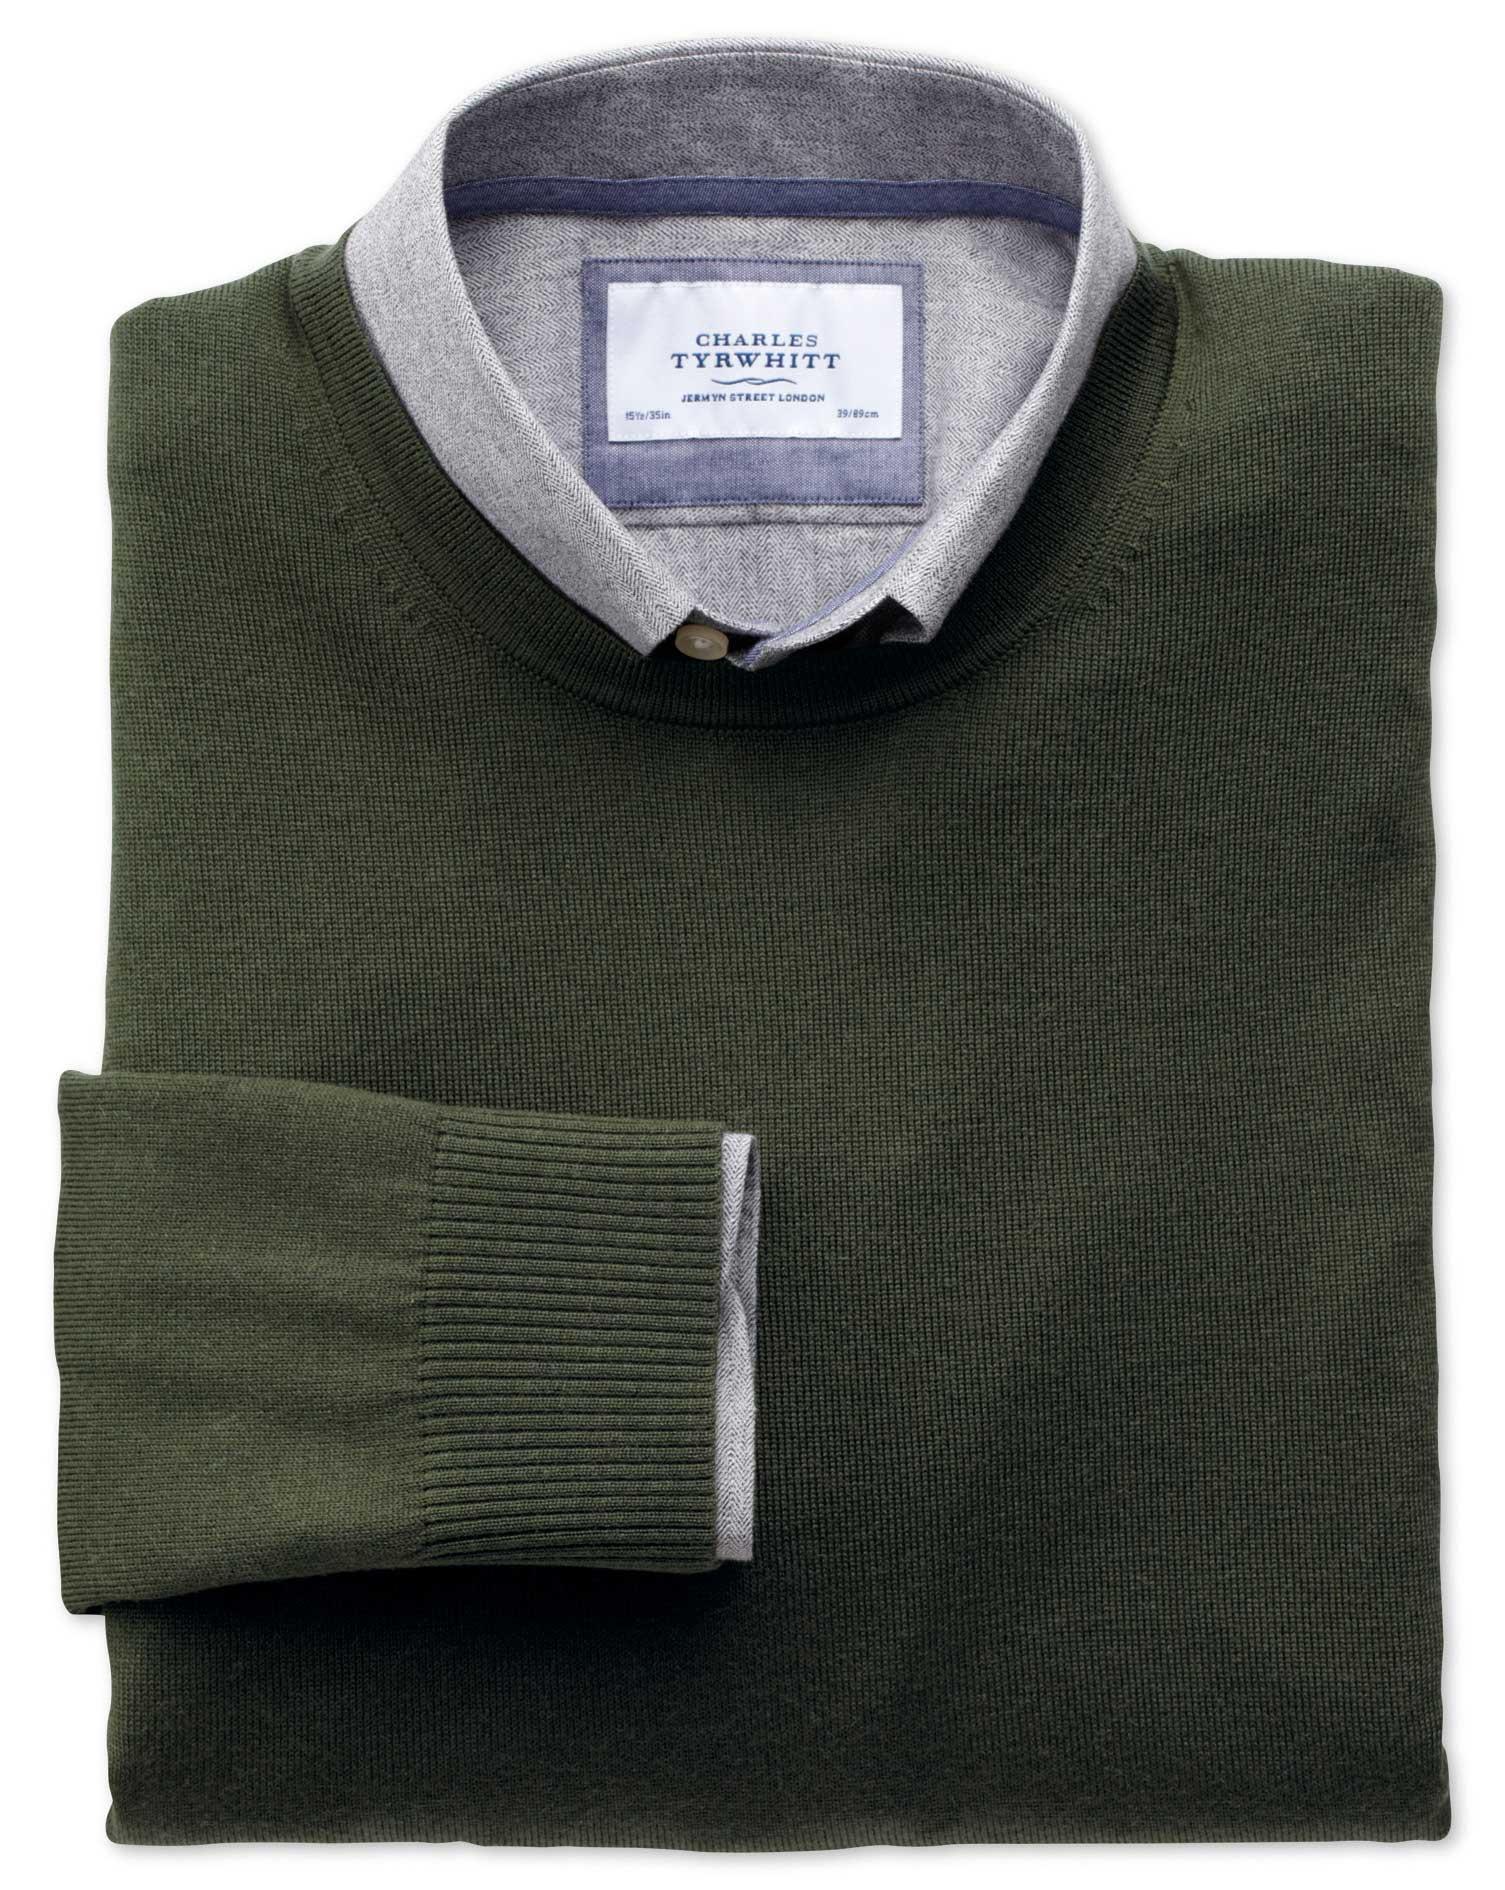 Dark Green Merino Wool Crew Neck Jumper Size Medium by Charles Tyrwhitt